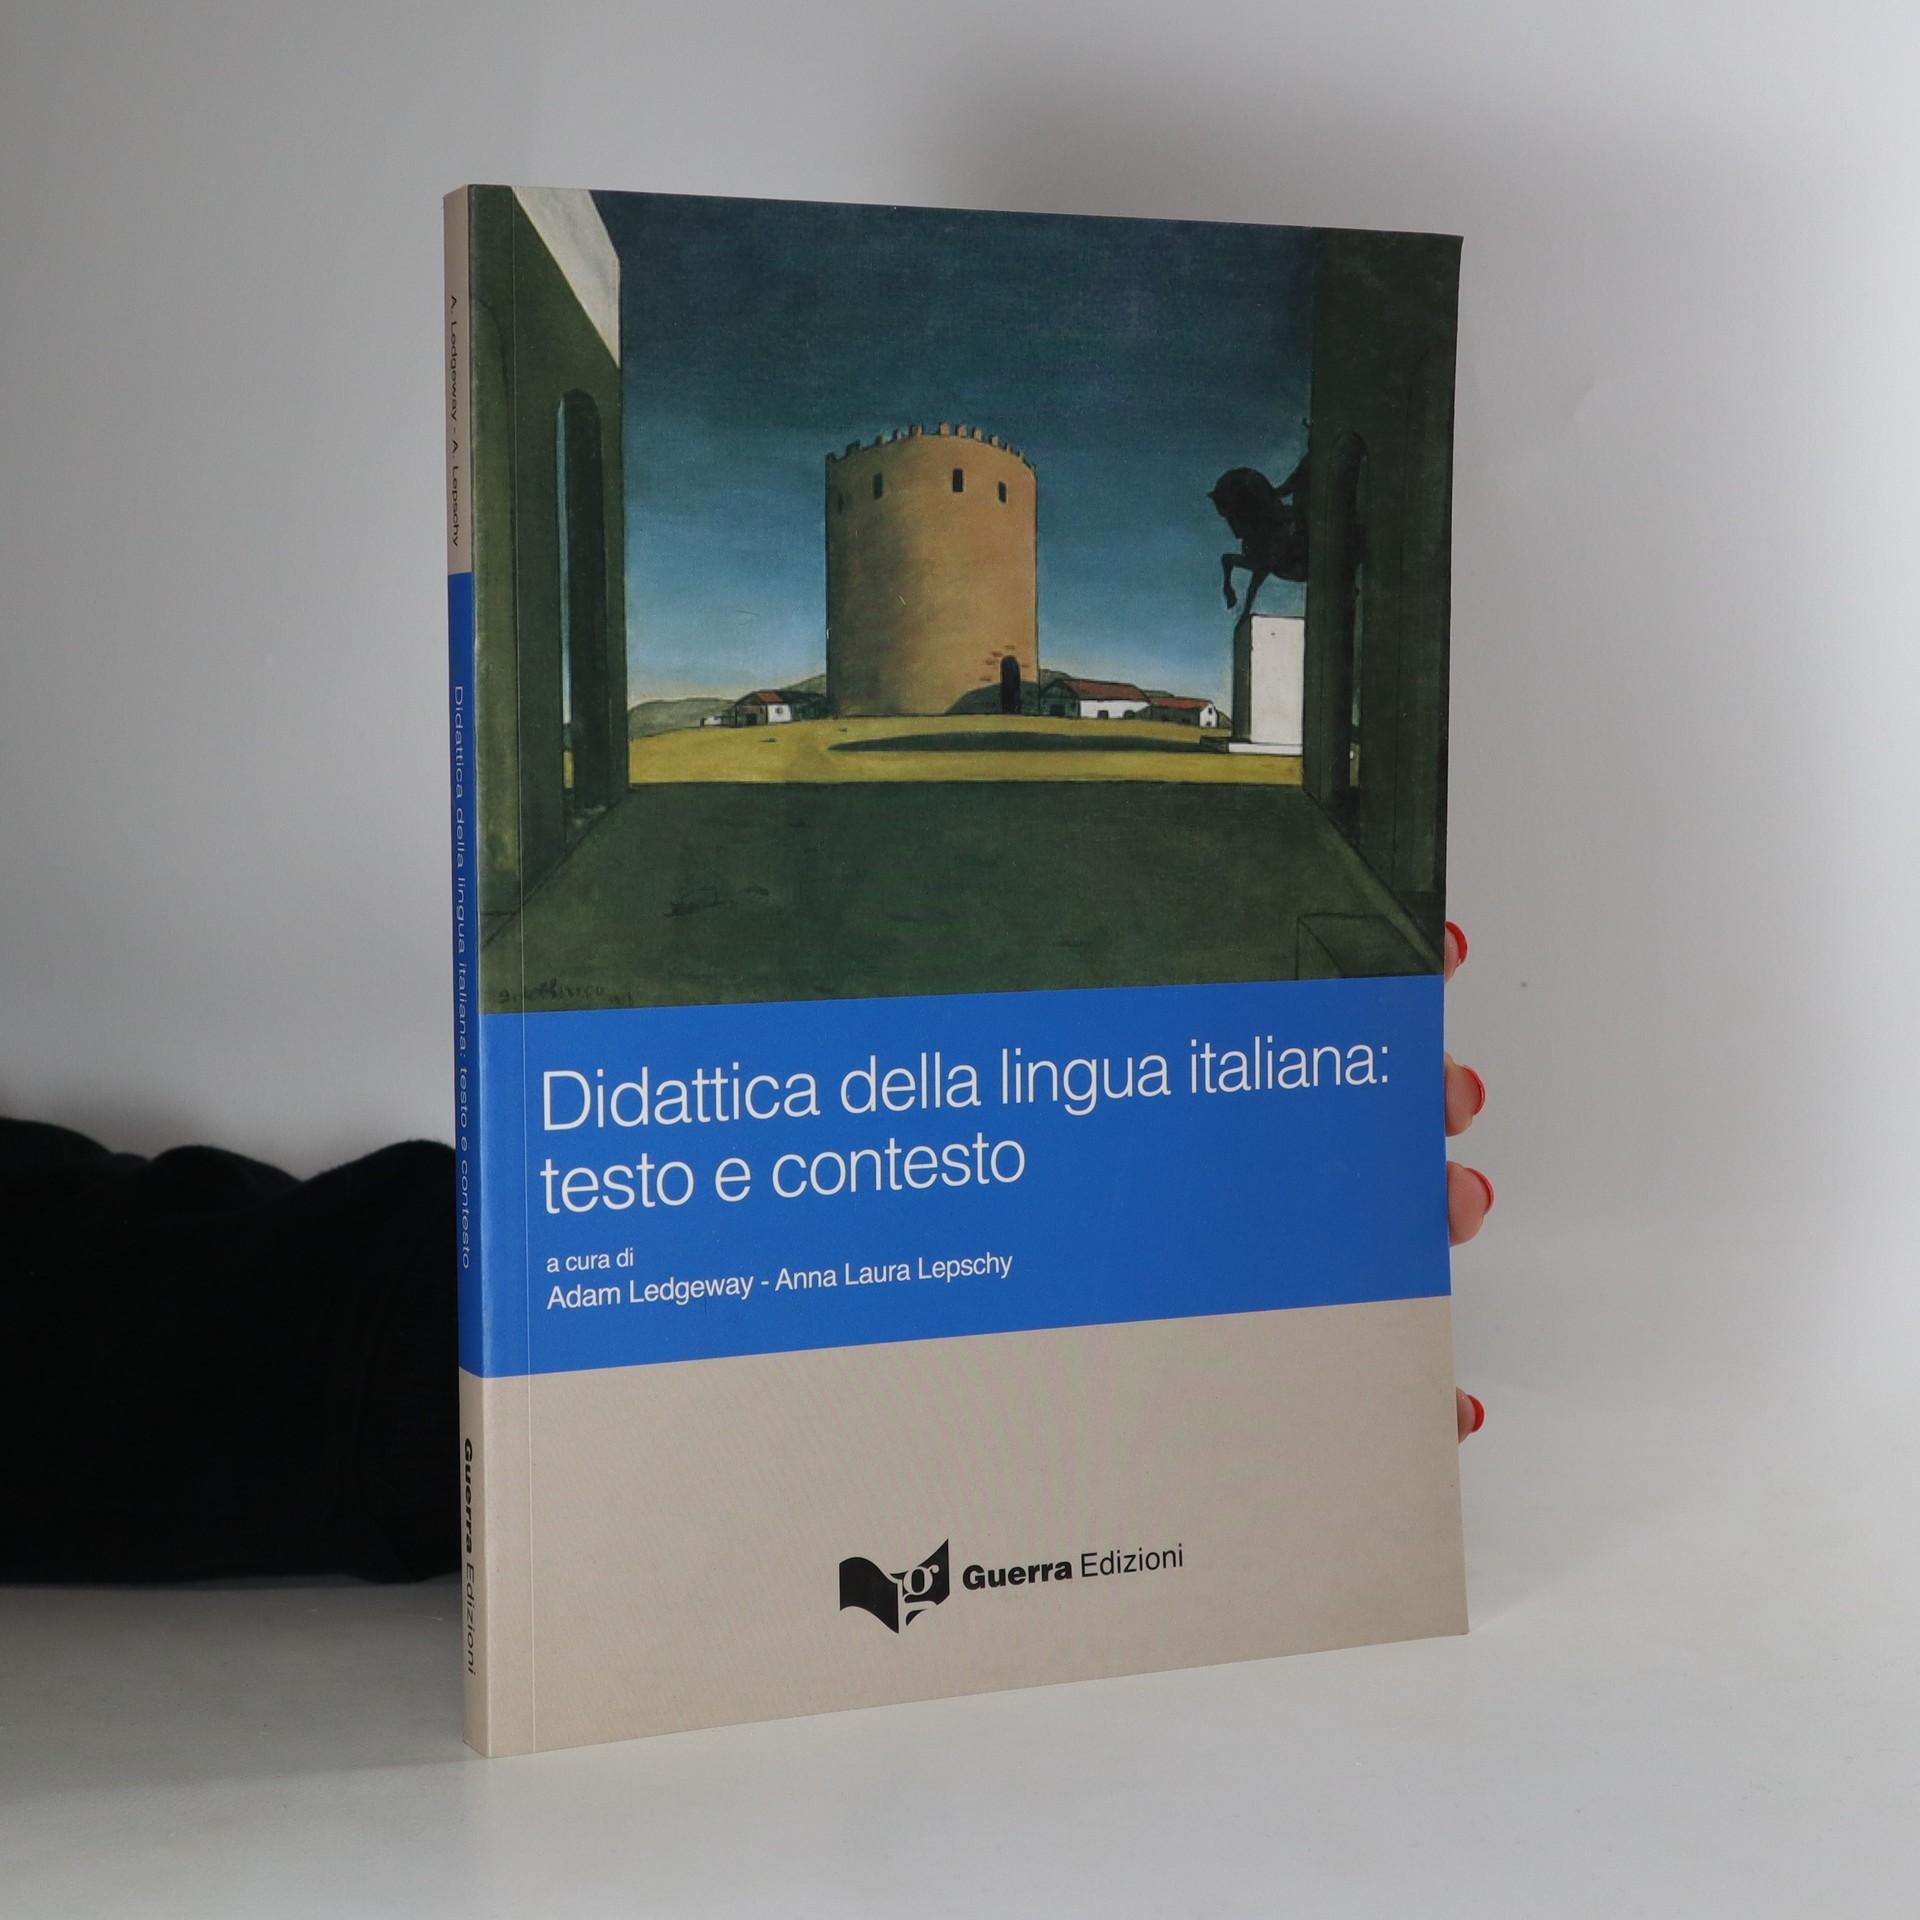 antikvární kniha Didattica della lingua italiana, neuveden